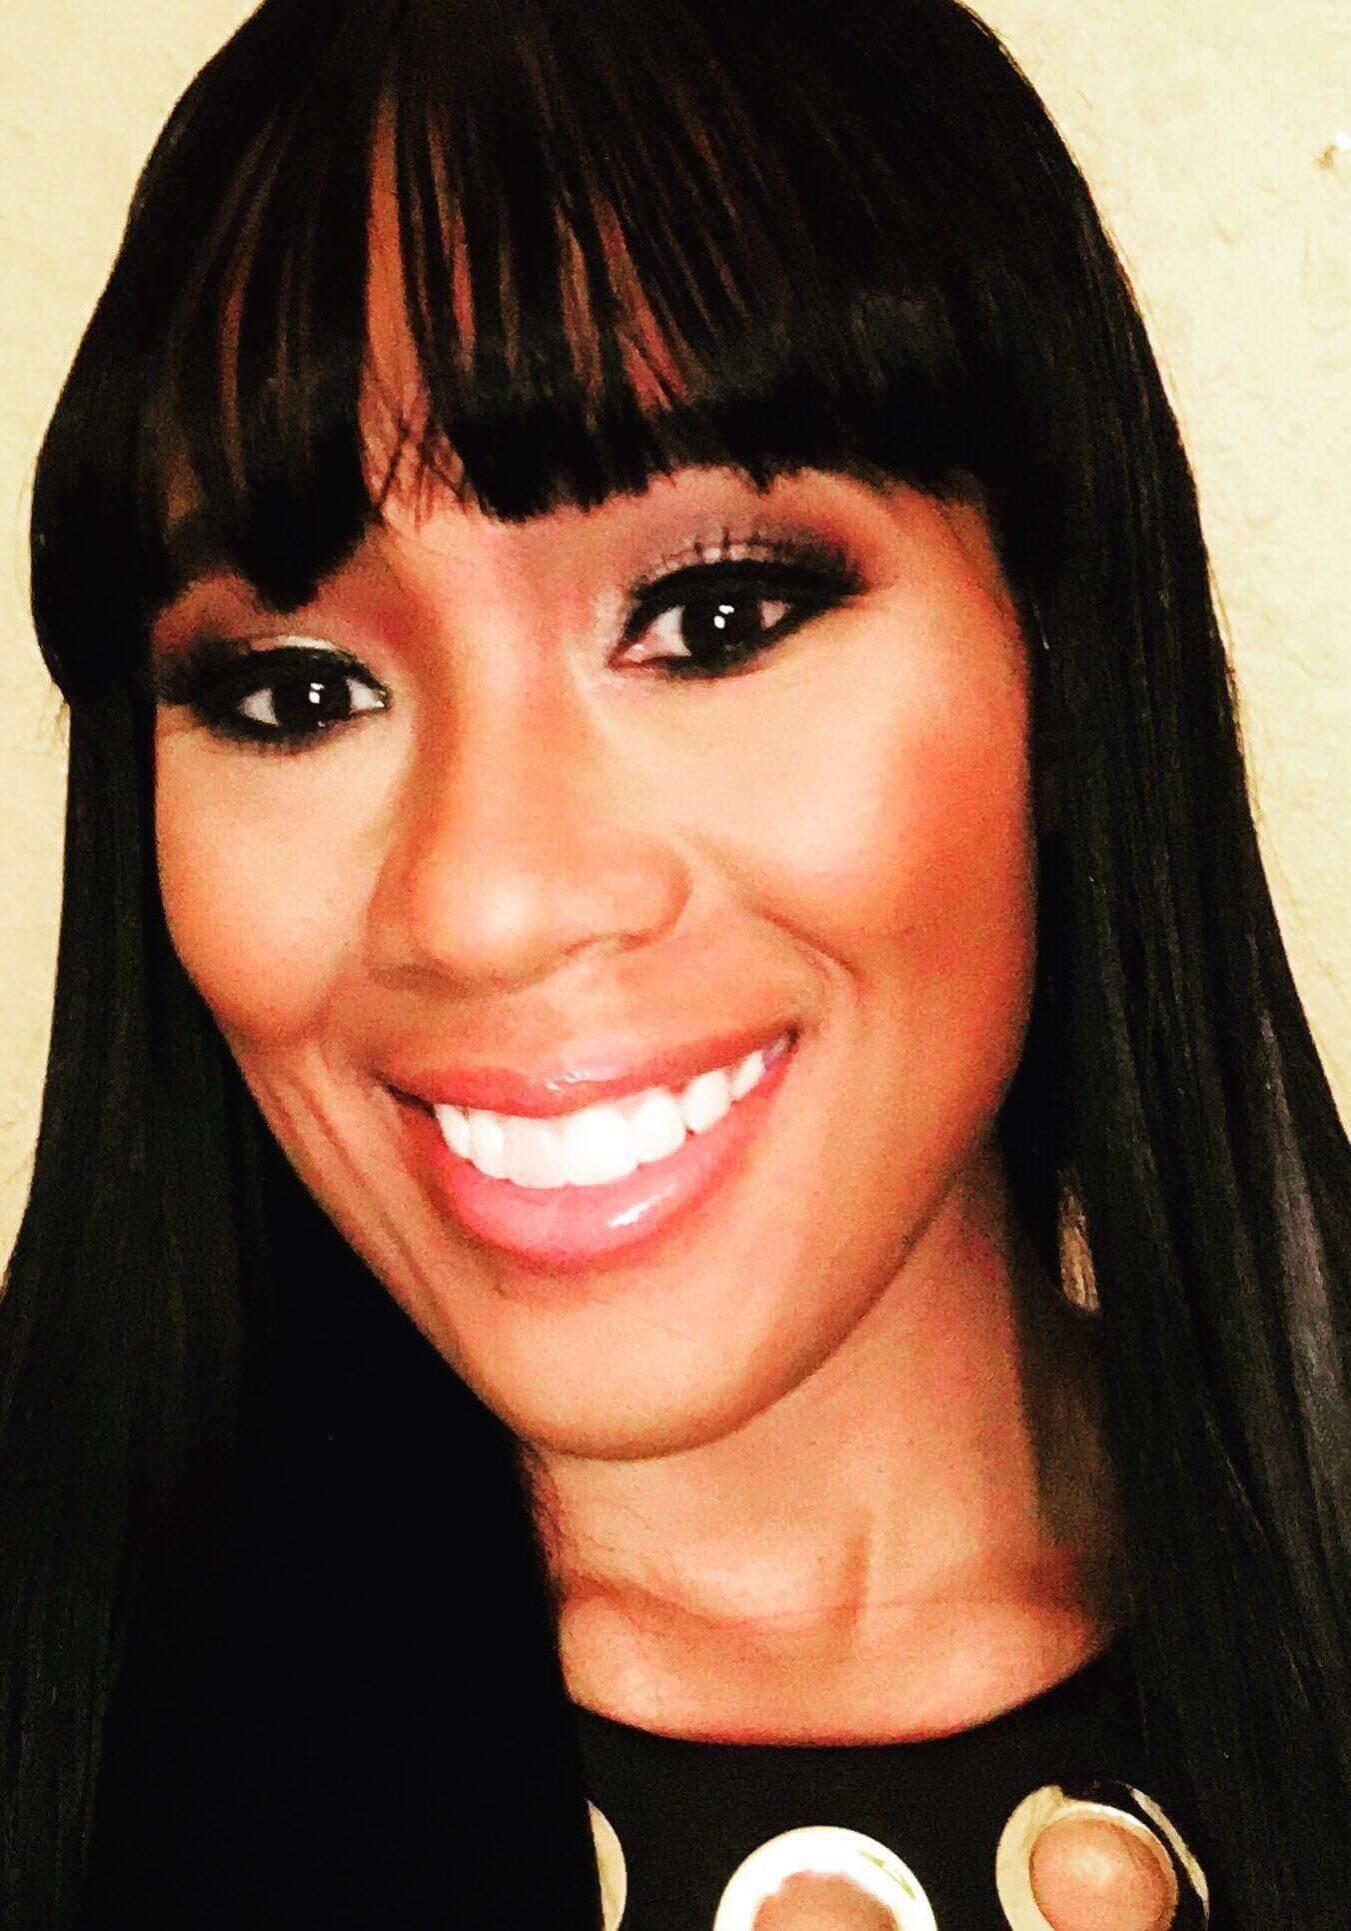 Dr. Rhonika Thomas | The Mindset Reset Experience | Registered Nurse | Naomi Jones | Events | Speaker |